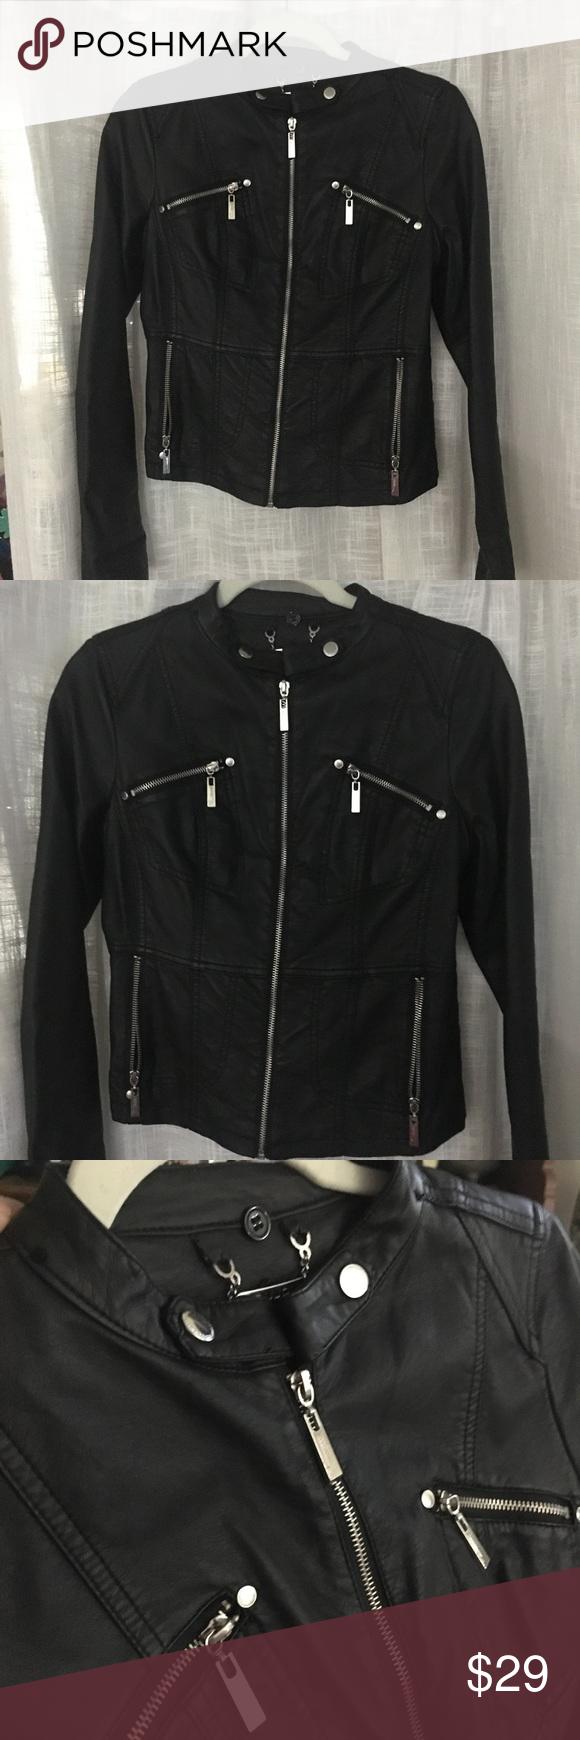 Joujou faux leather jacket Faux leather jacket. Used but